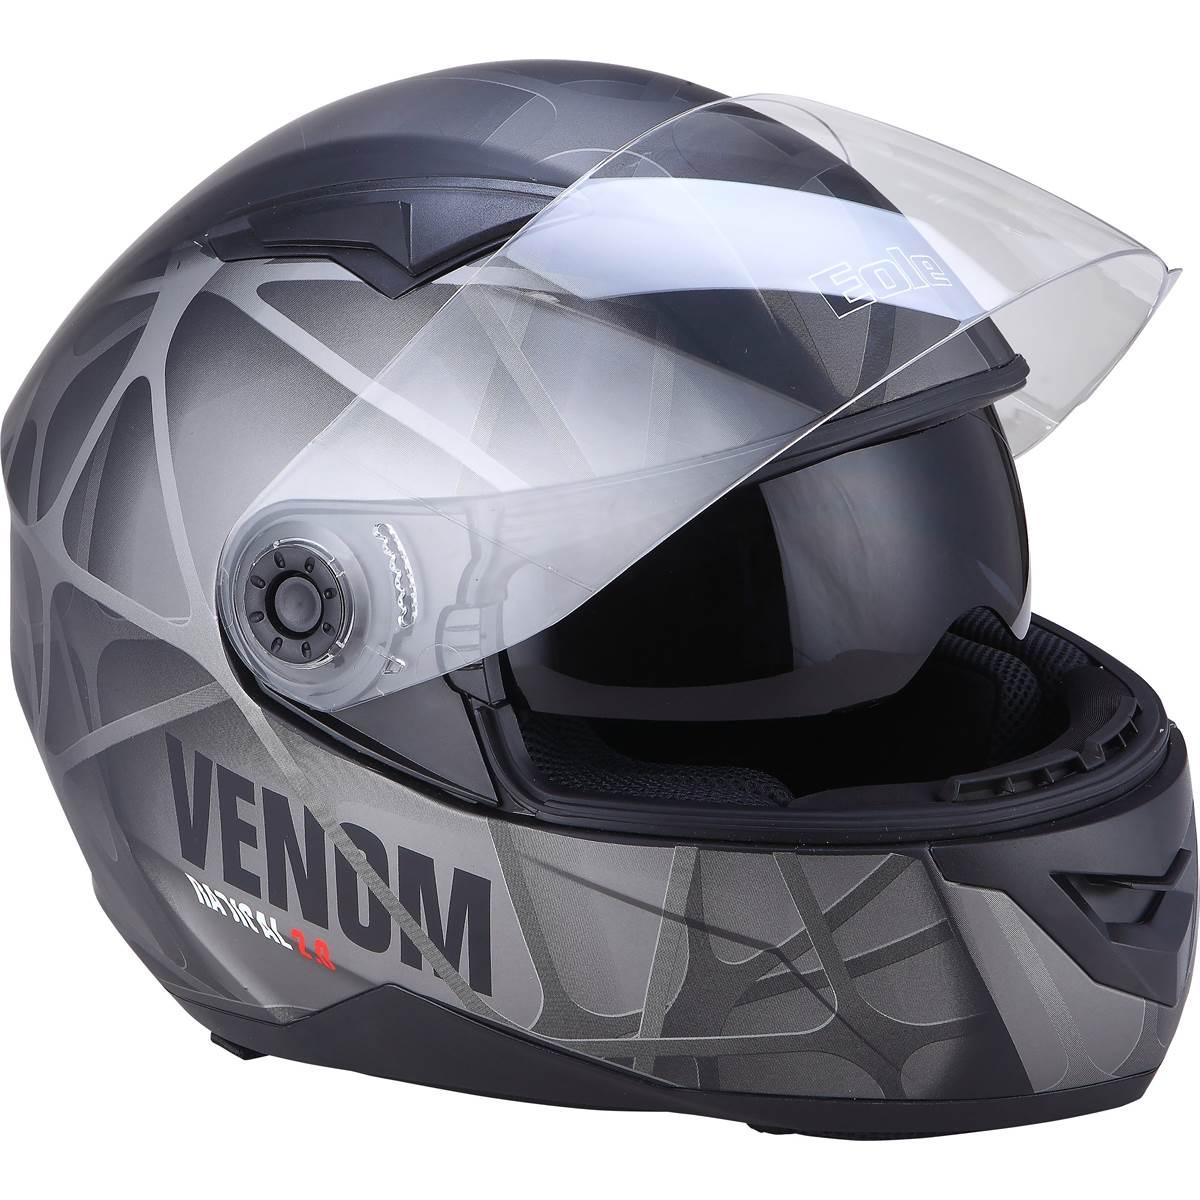 moto scooter casque. Black Bedroom Furniture Sets. Home Design Ideas